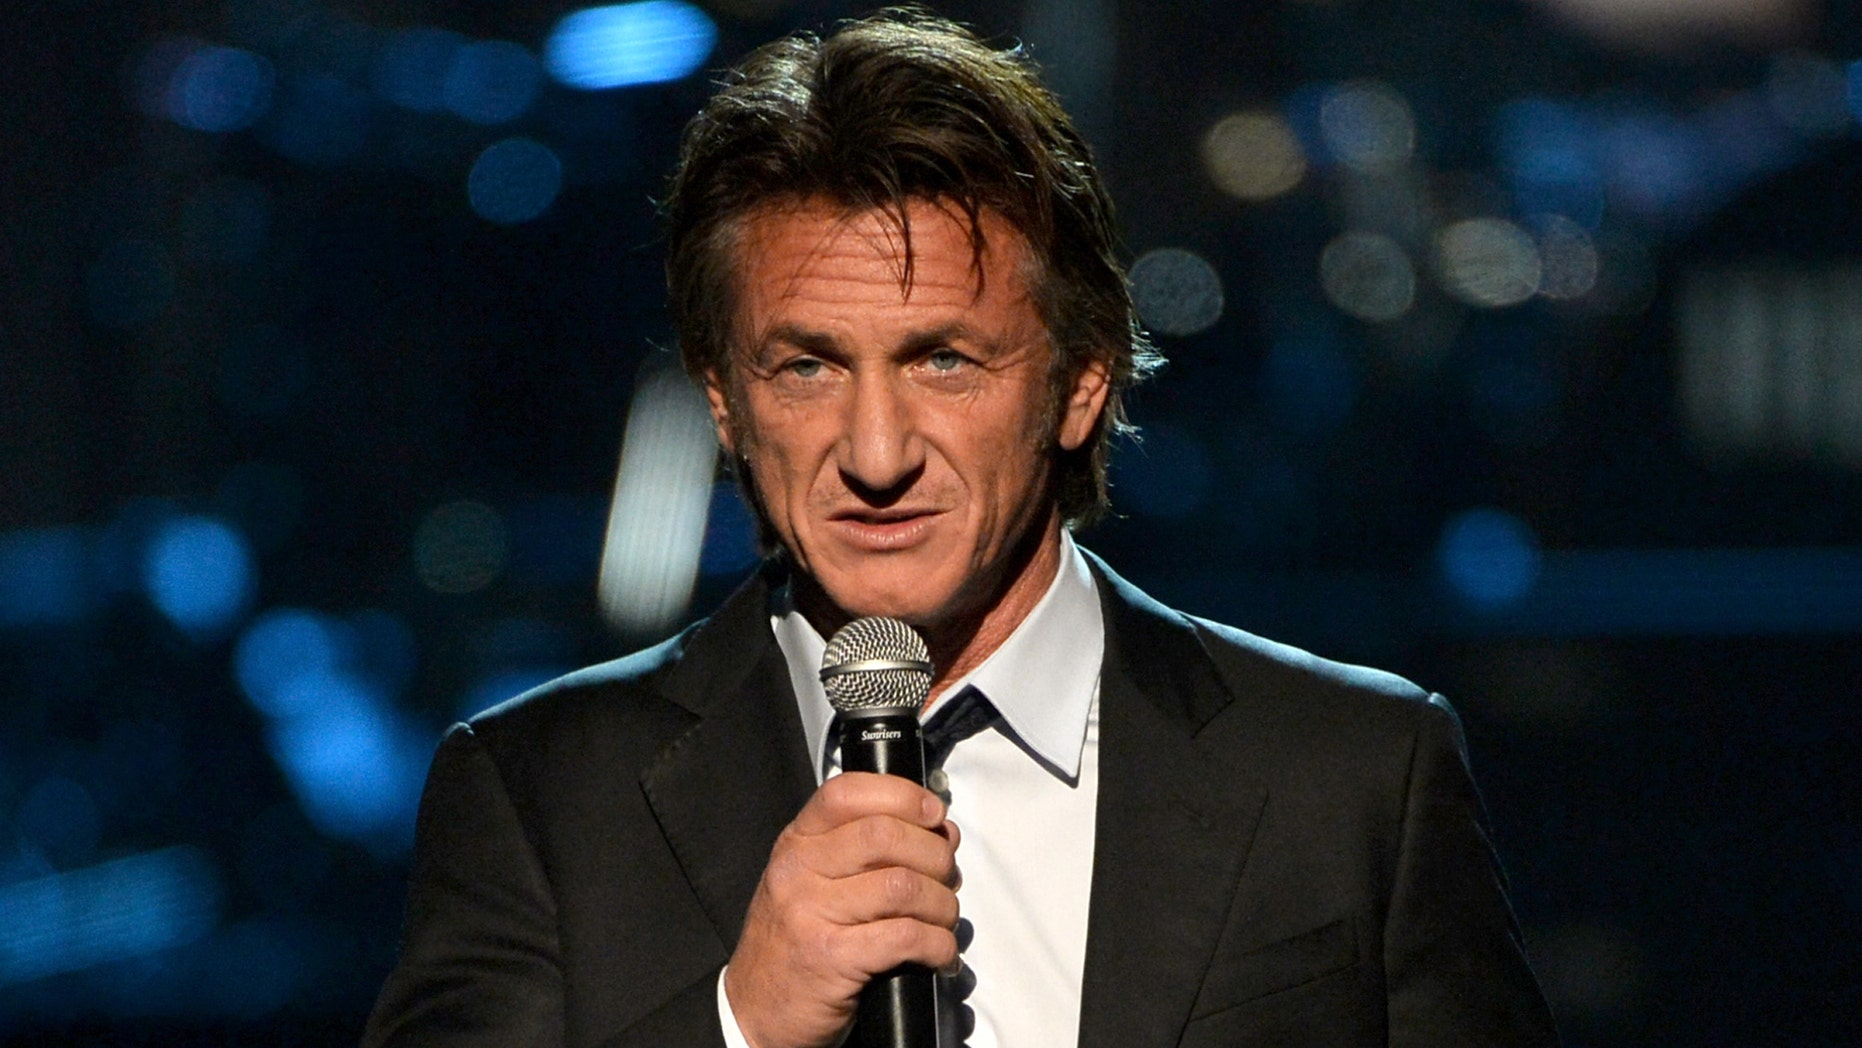 Actor Sean Penn on January 27, 2014 in Los Angeles, California.